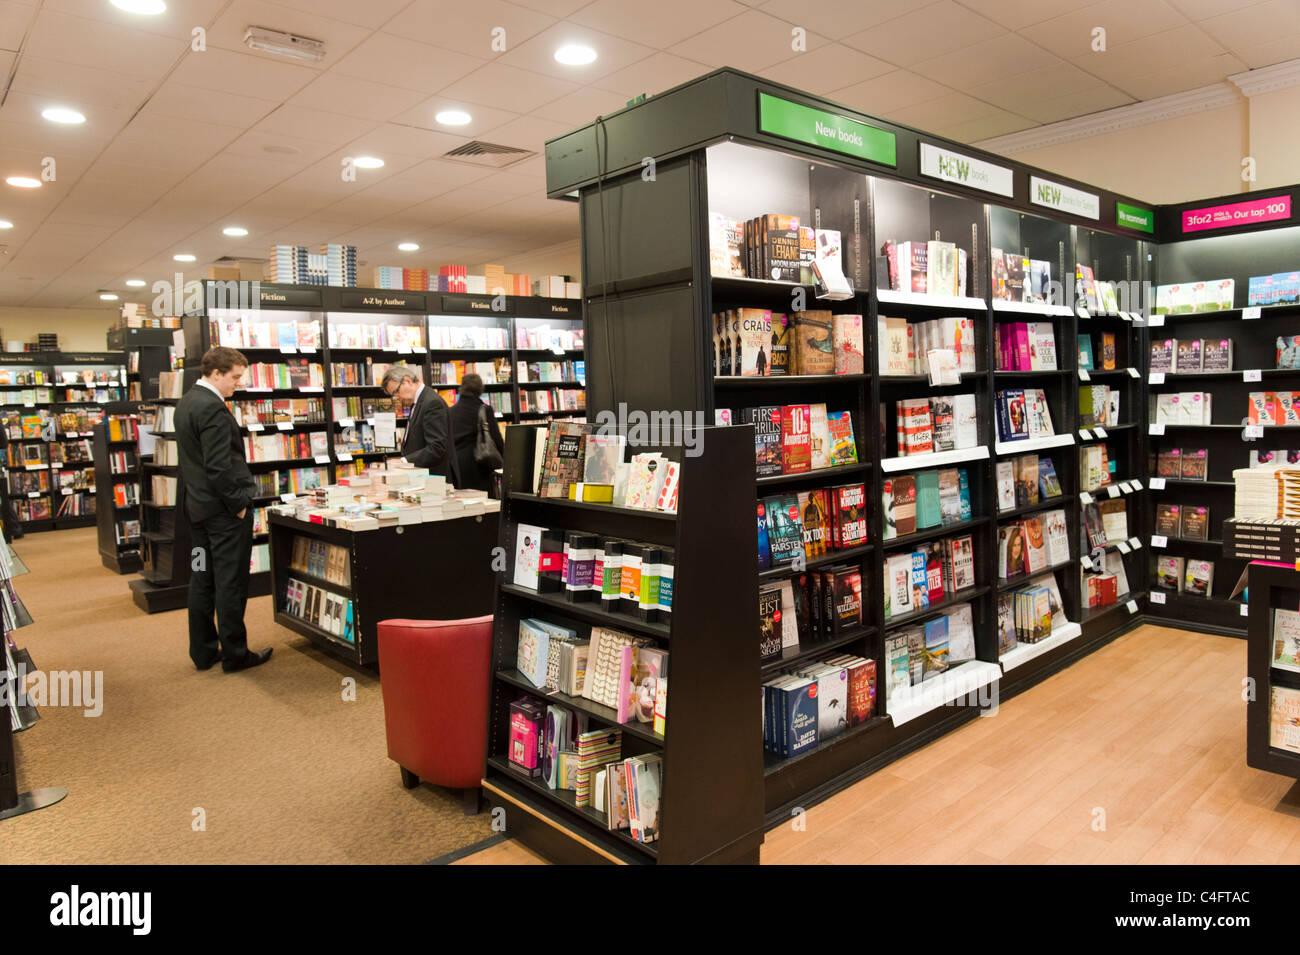 Waterstone's bookshop, London, UK - Stock Image